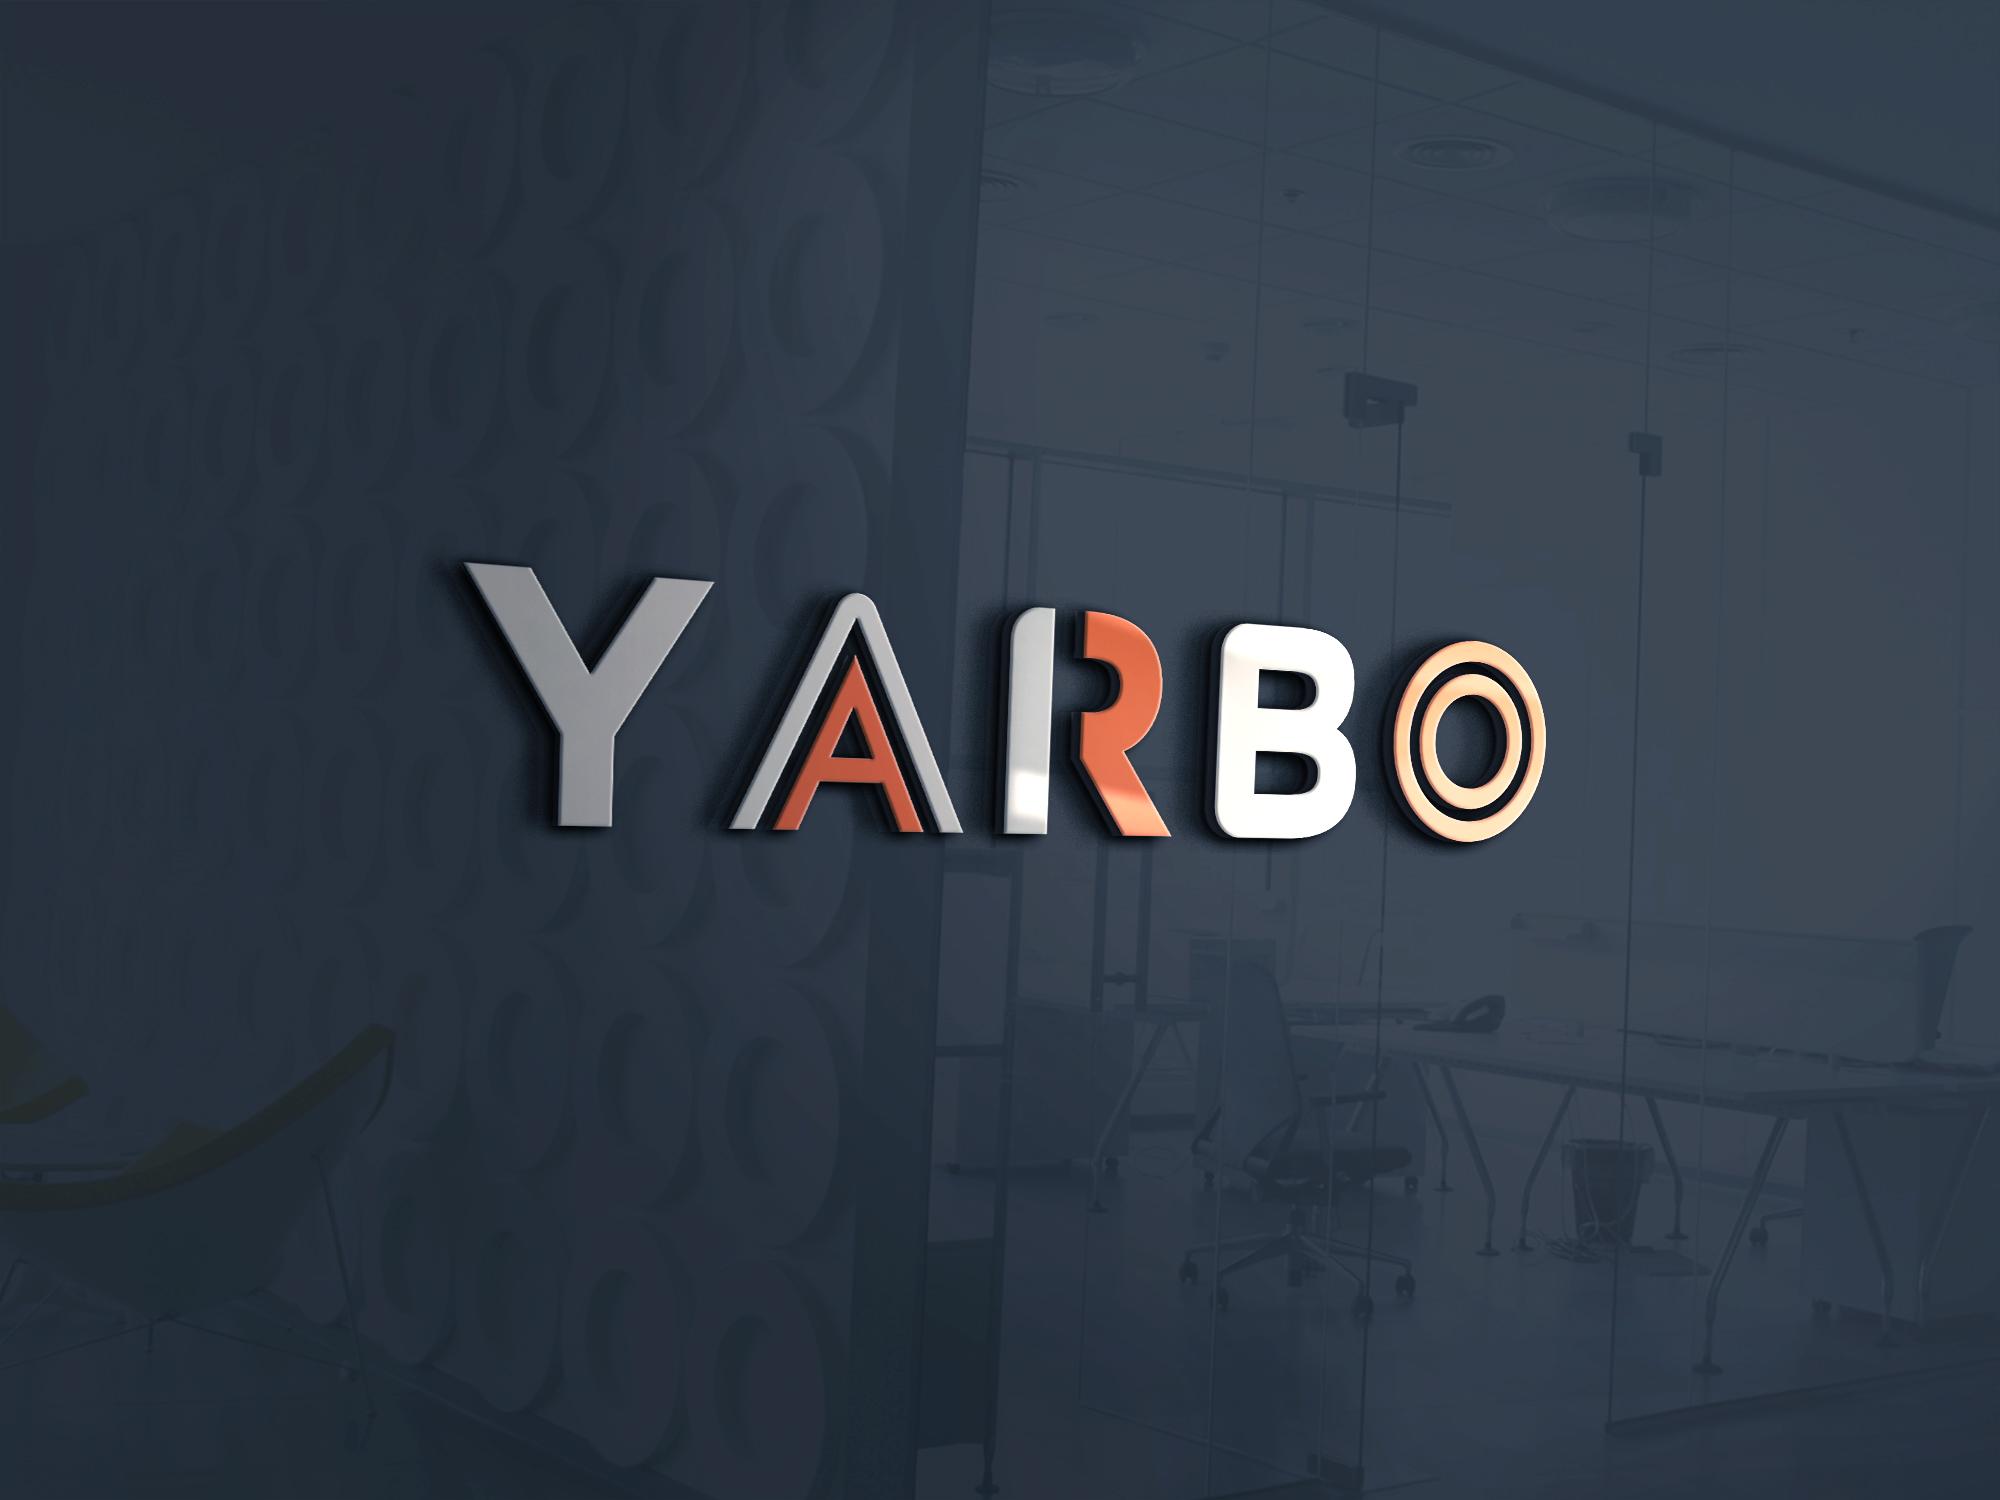 Yarbo 3